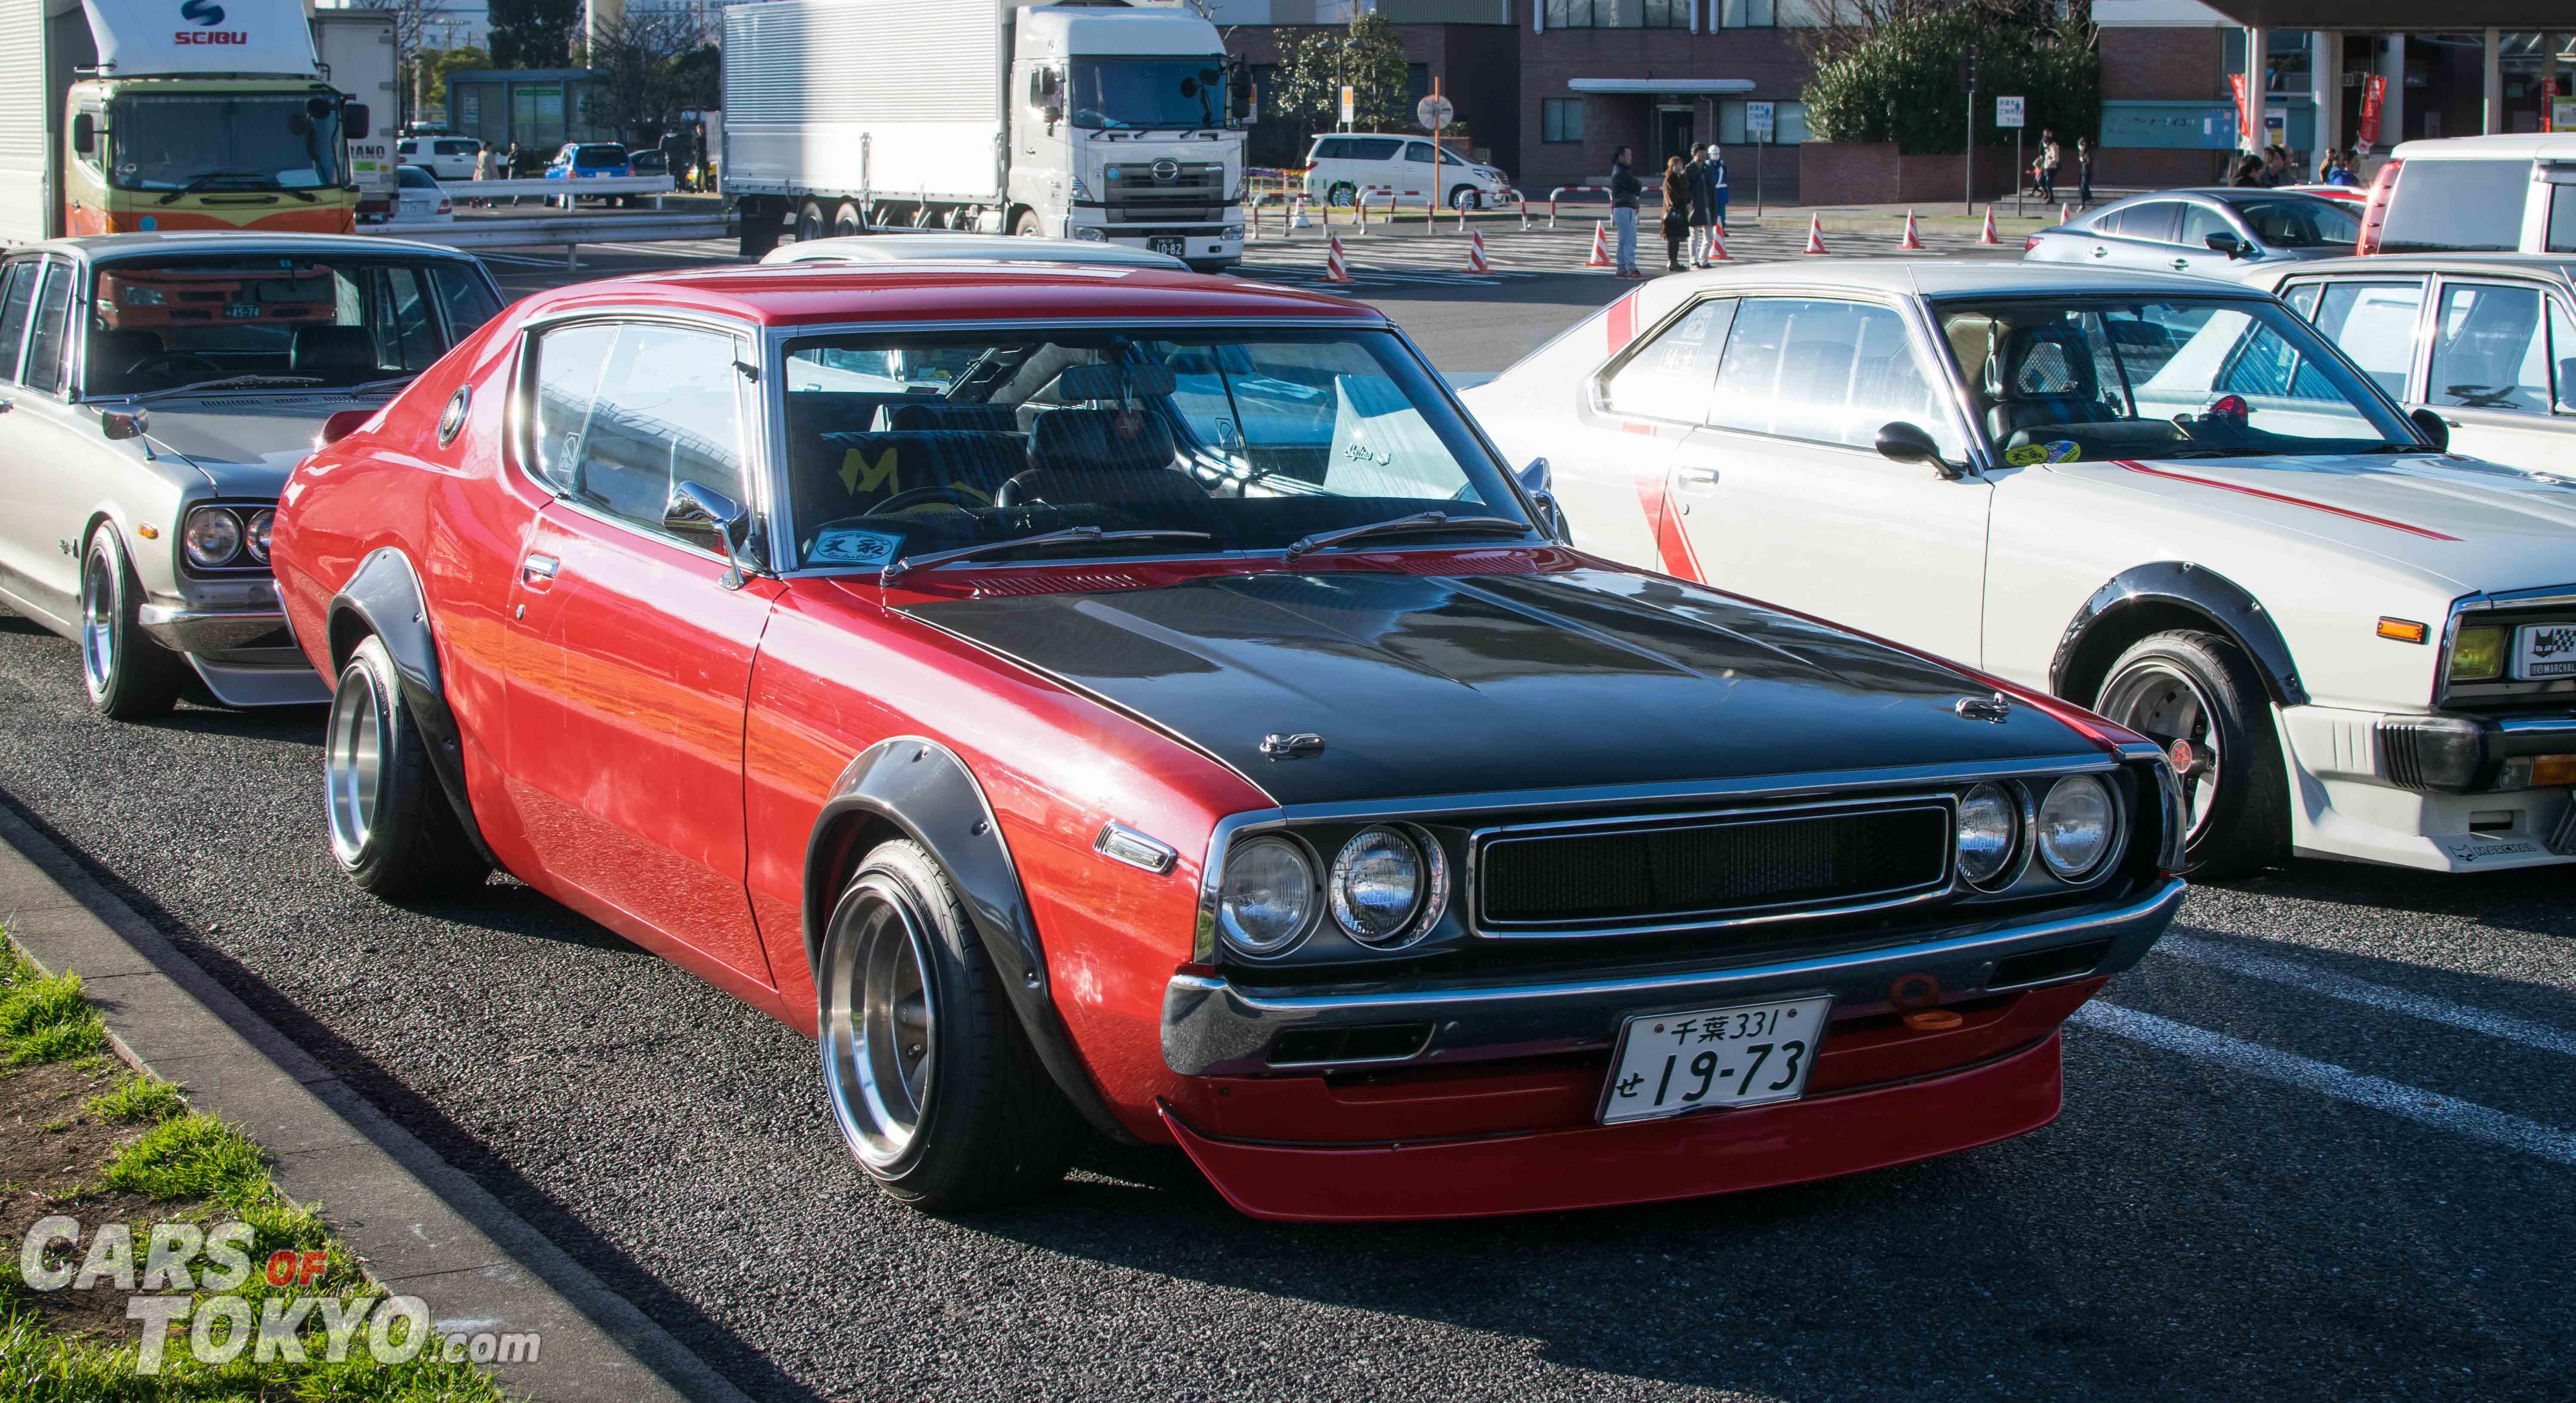 Cars of Tokyo Nissan Kenmeri